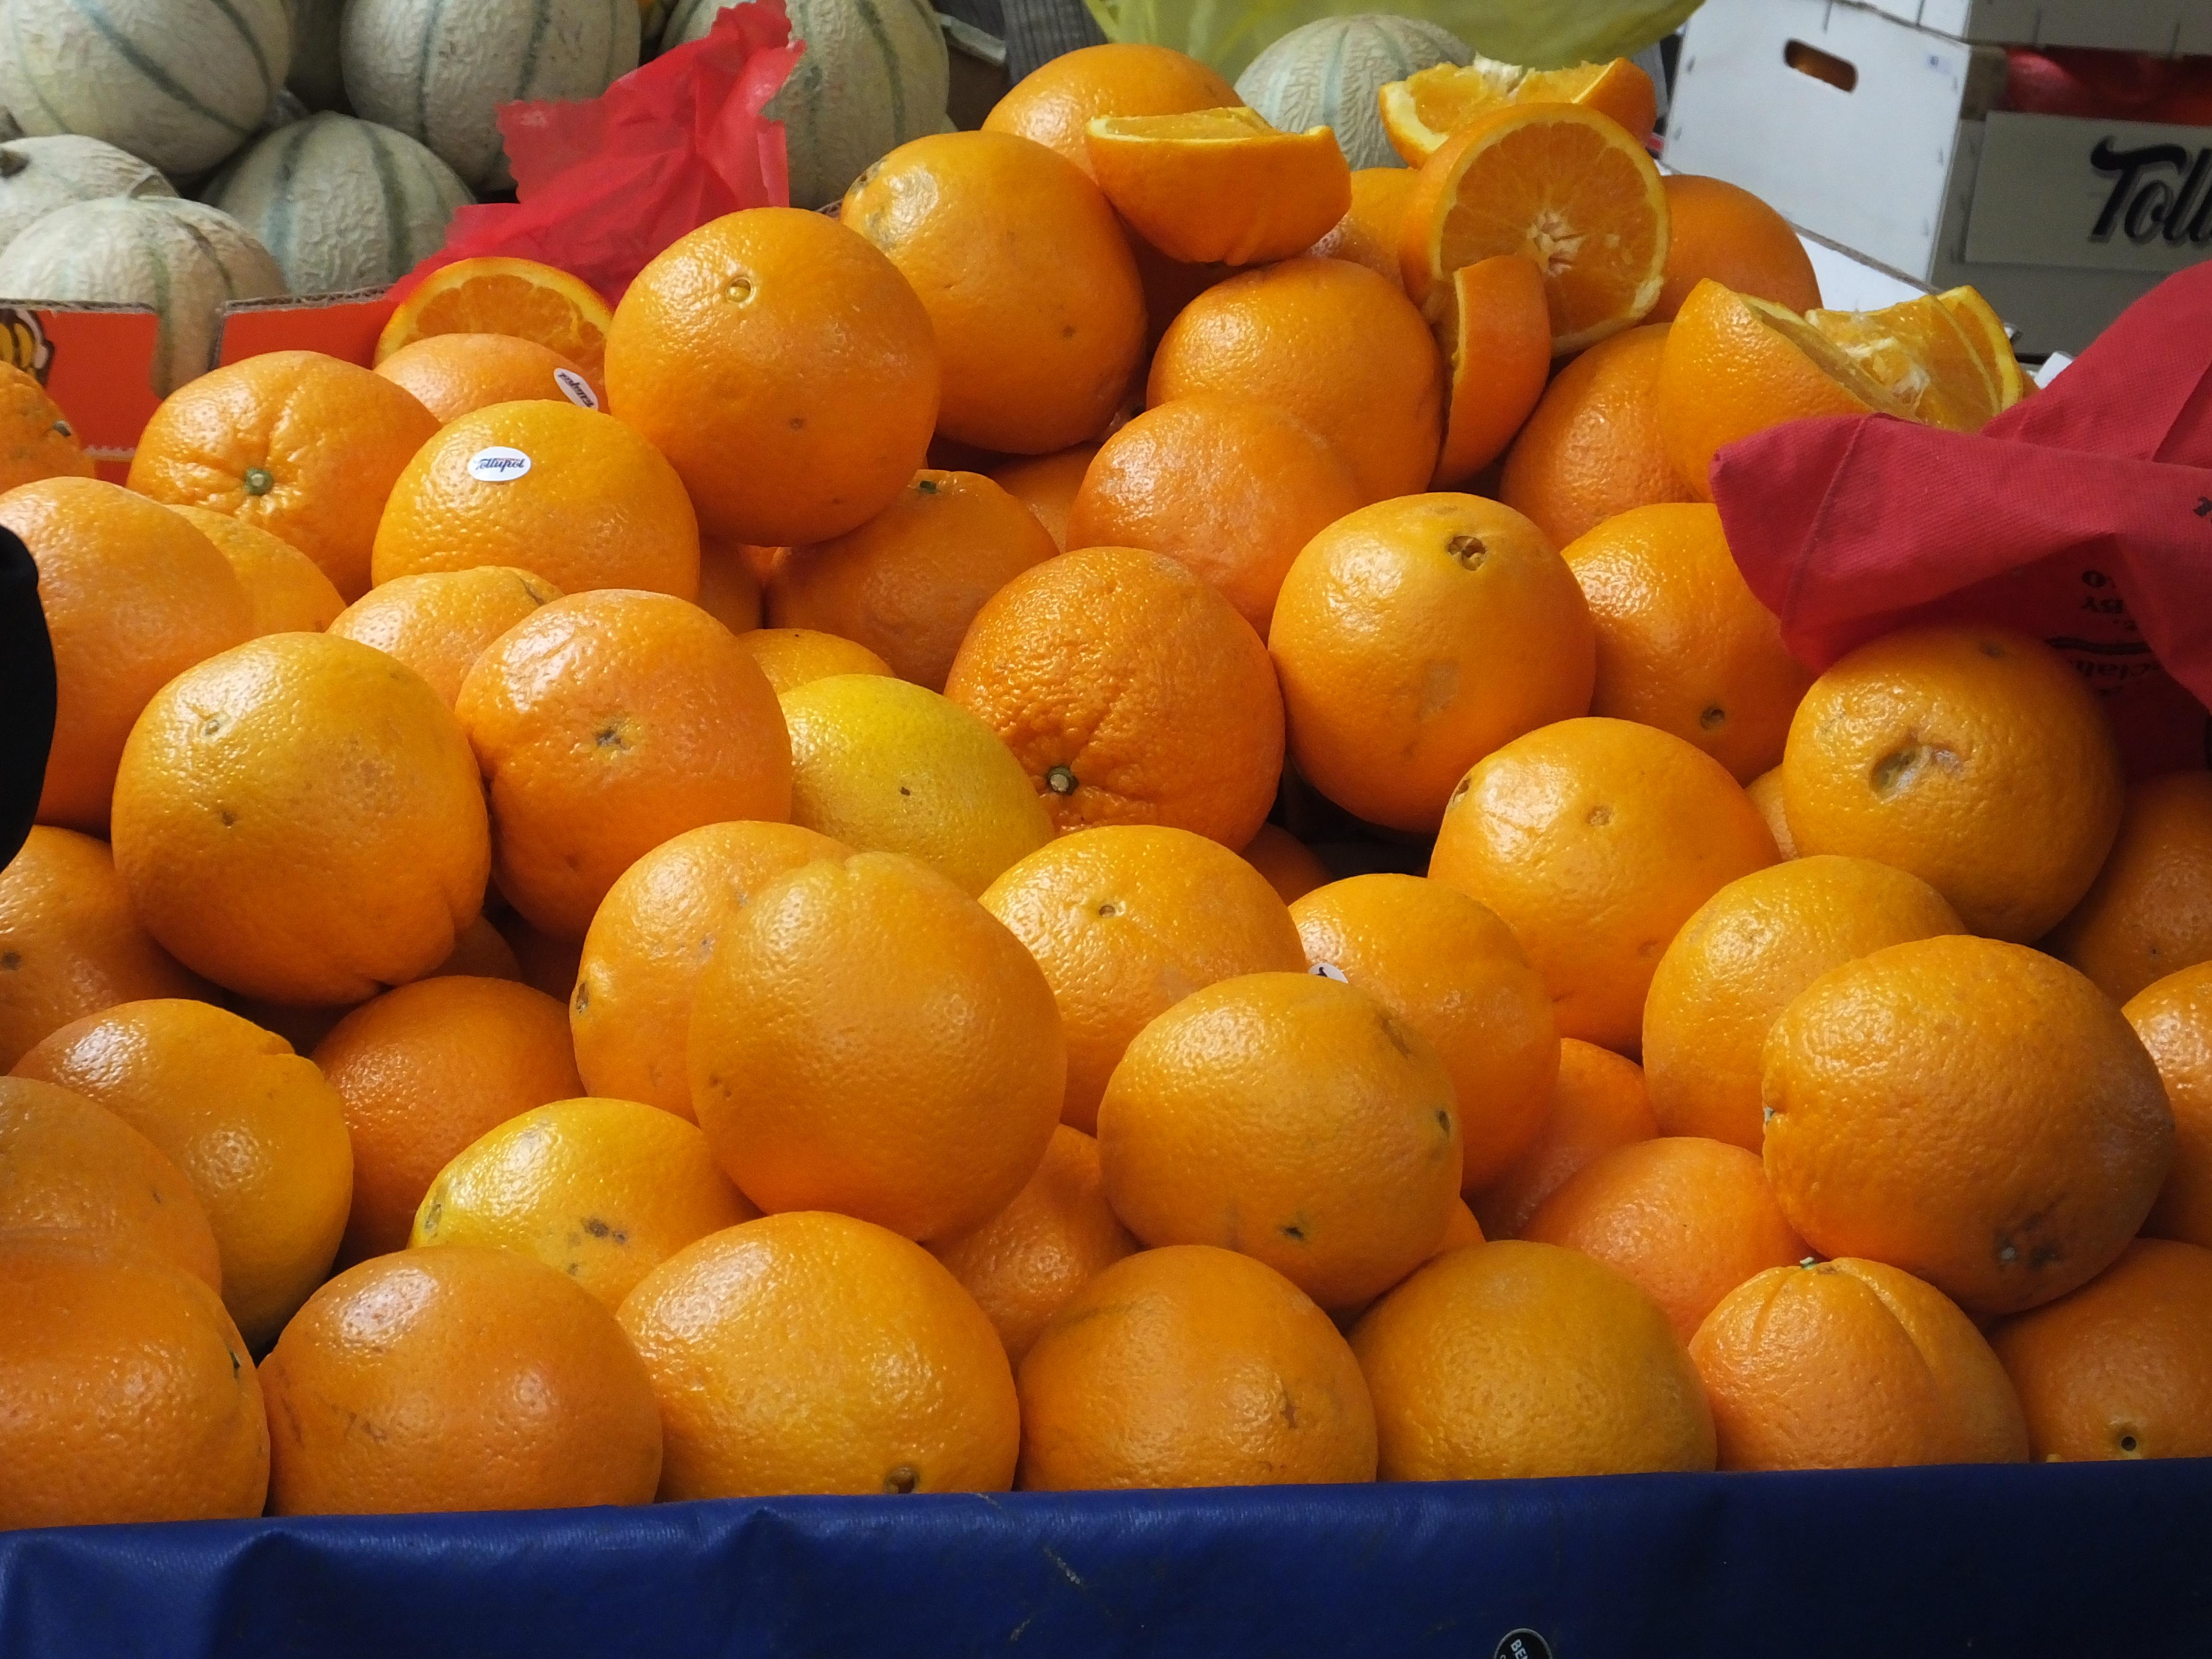 Wonderful oranges